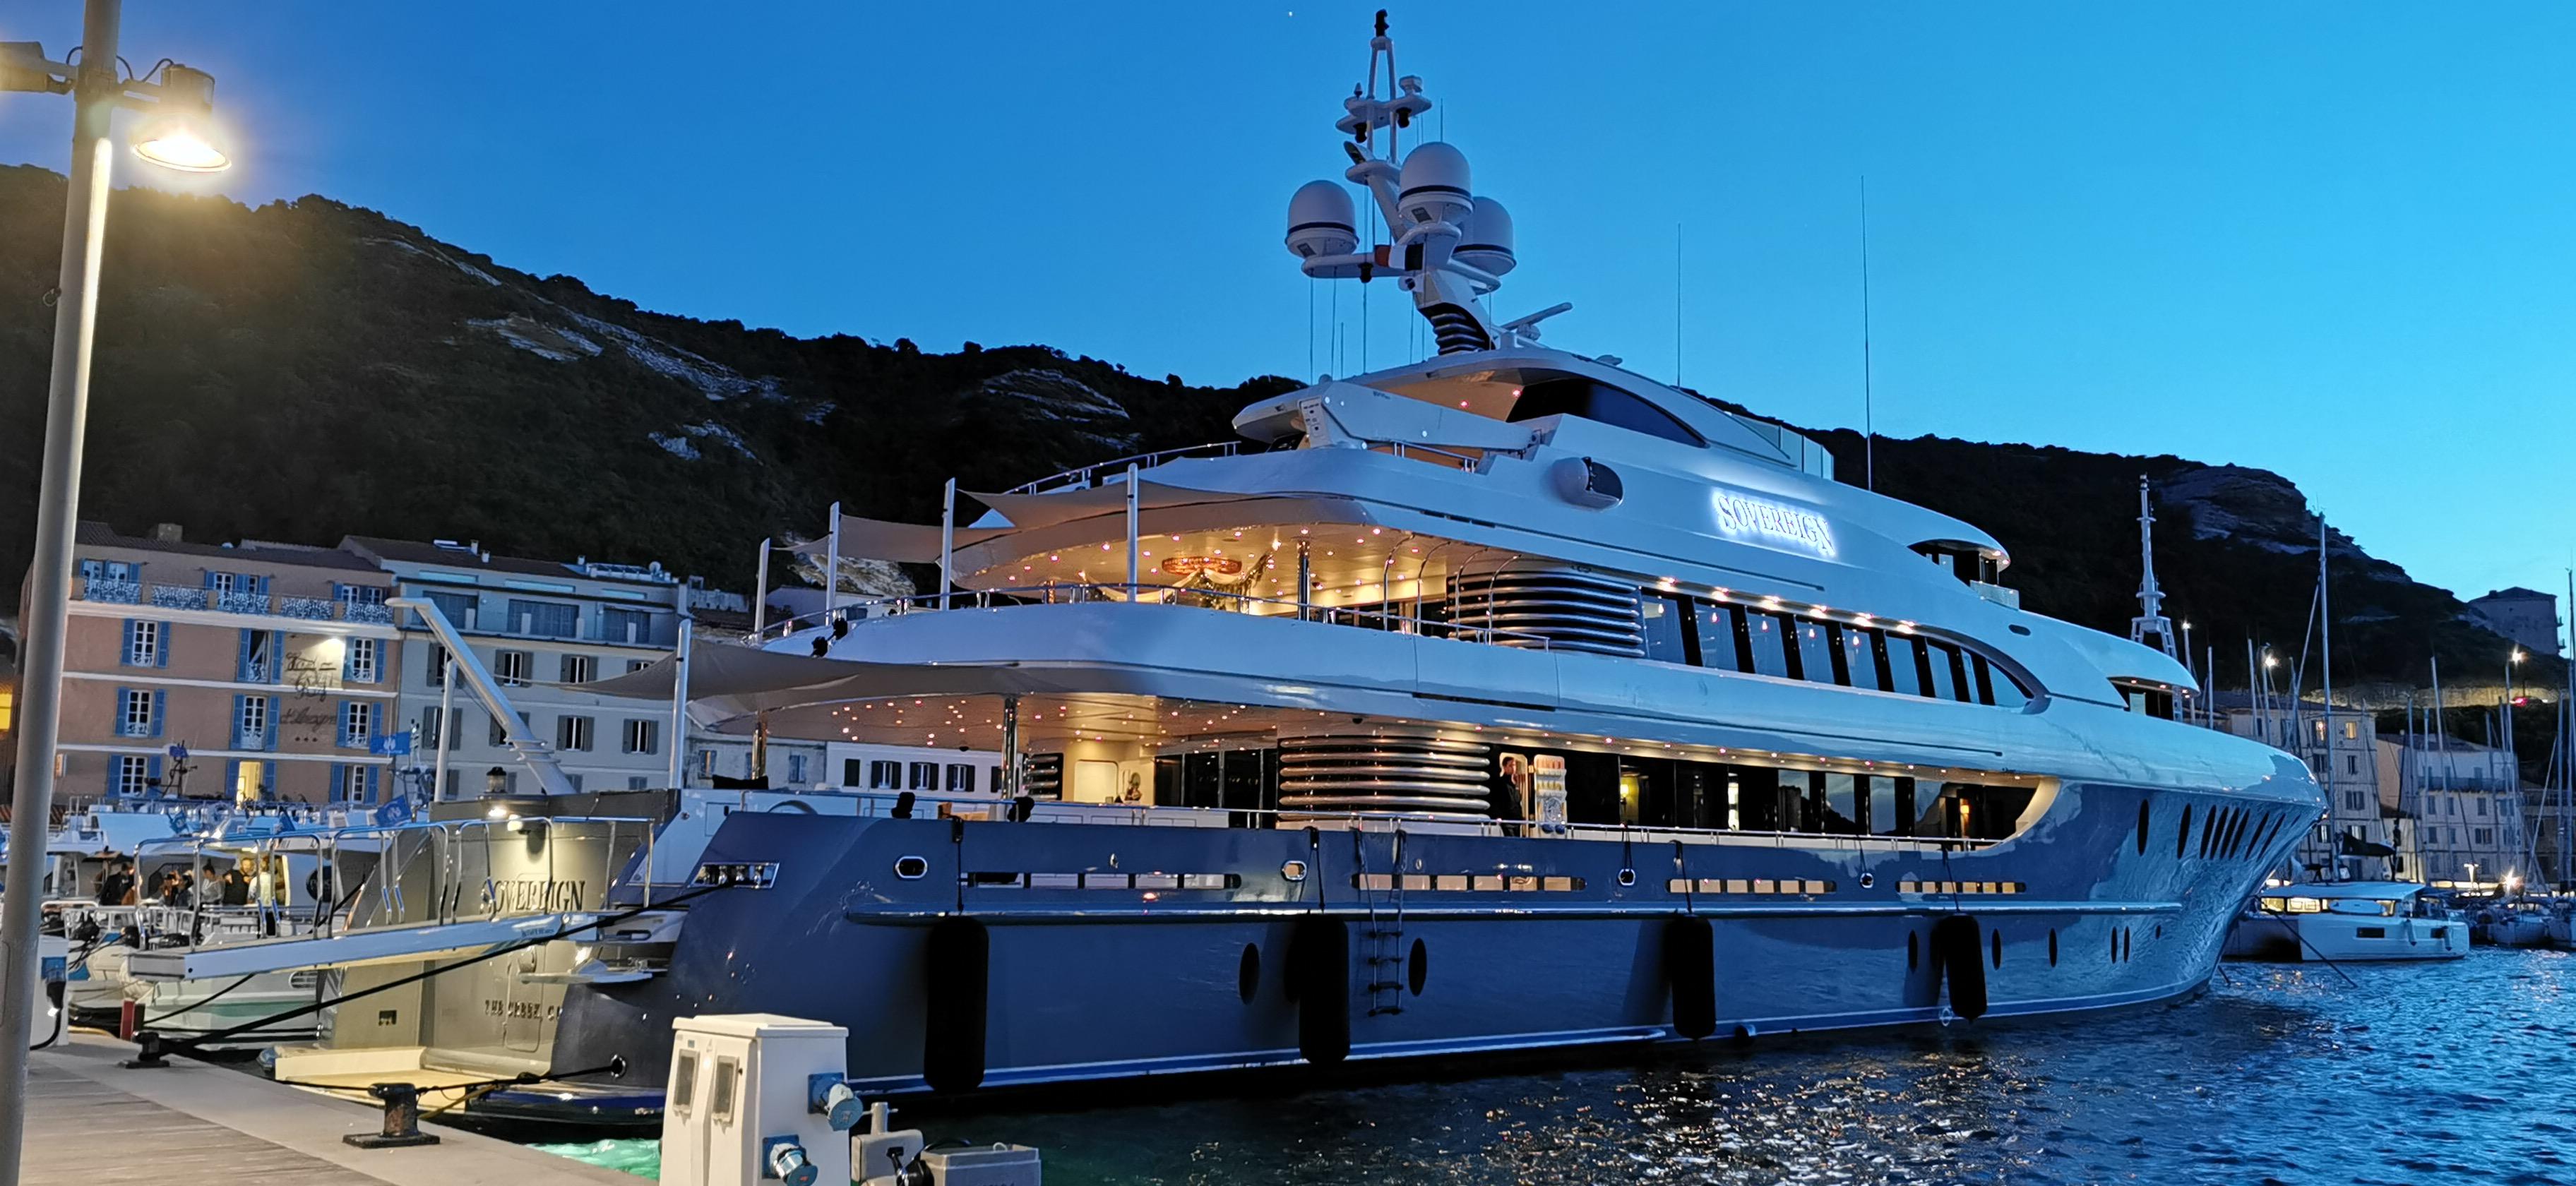 Luxury yacht Sovereign off Bonifacio - Photo Solenne Vaudin d'Imécourt